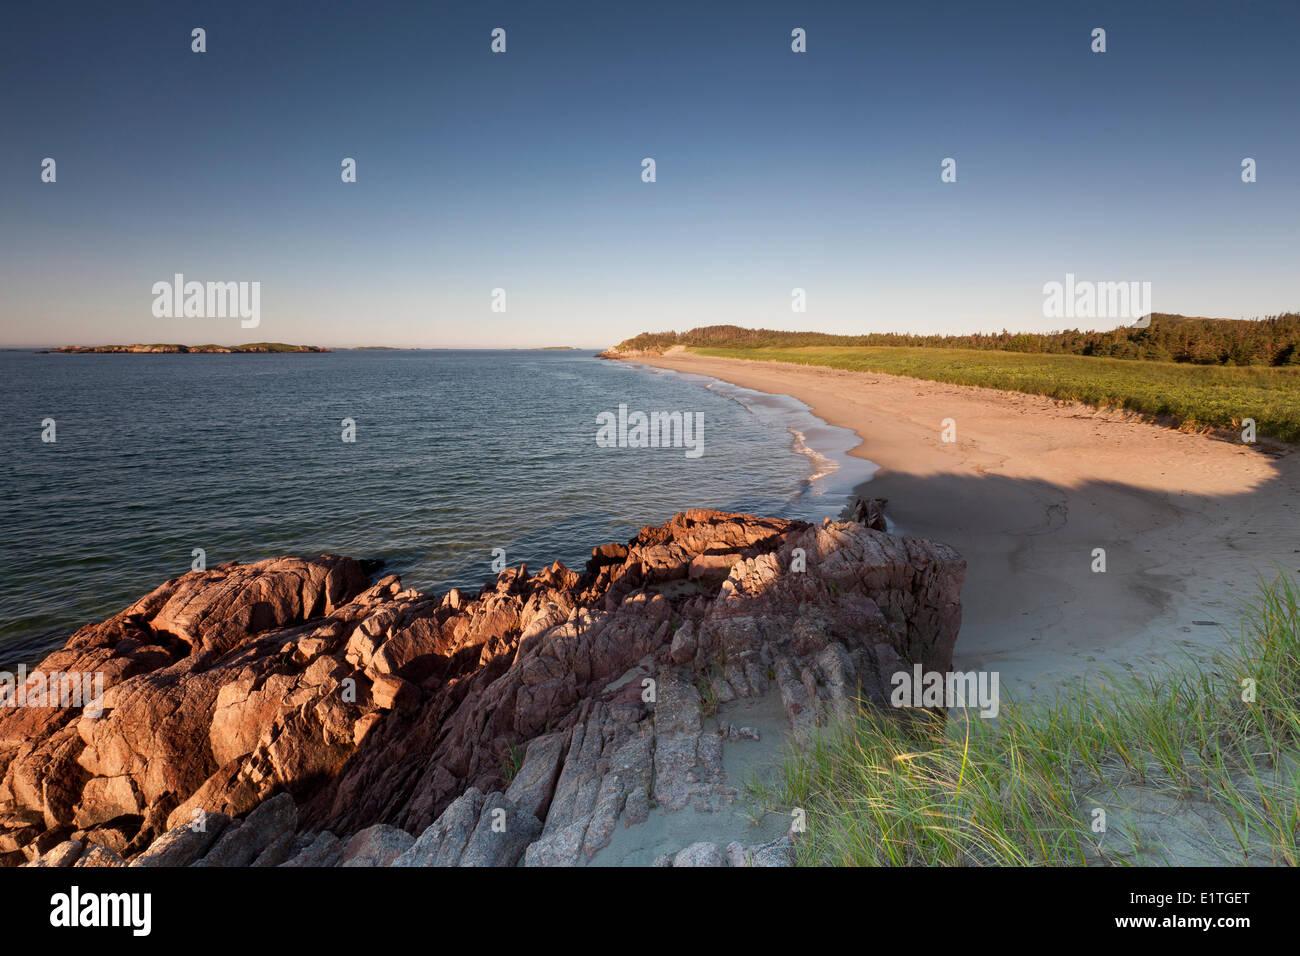 Sandy beach in Sandbanks Provincial Park in Burgeo on the